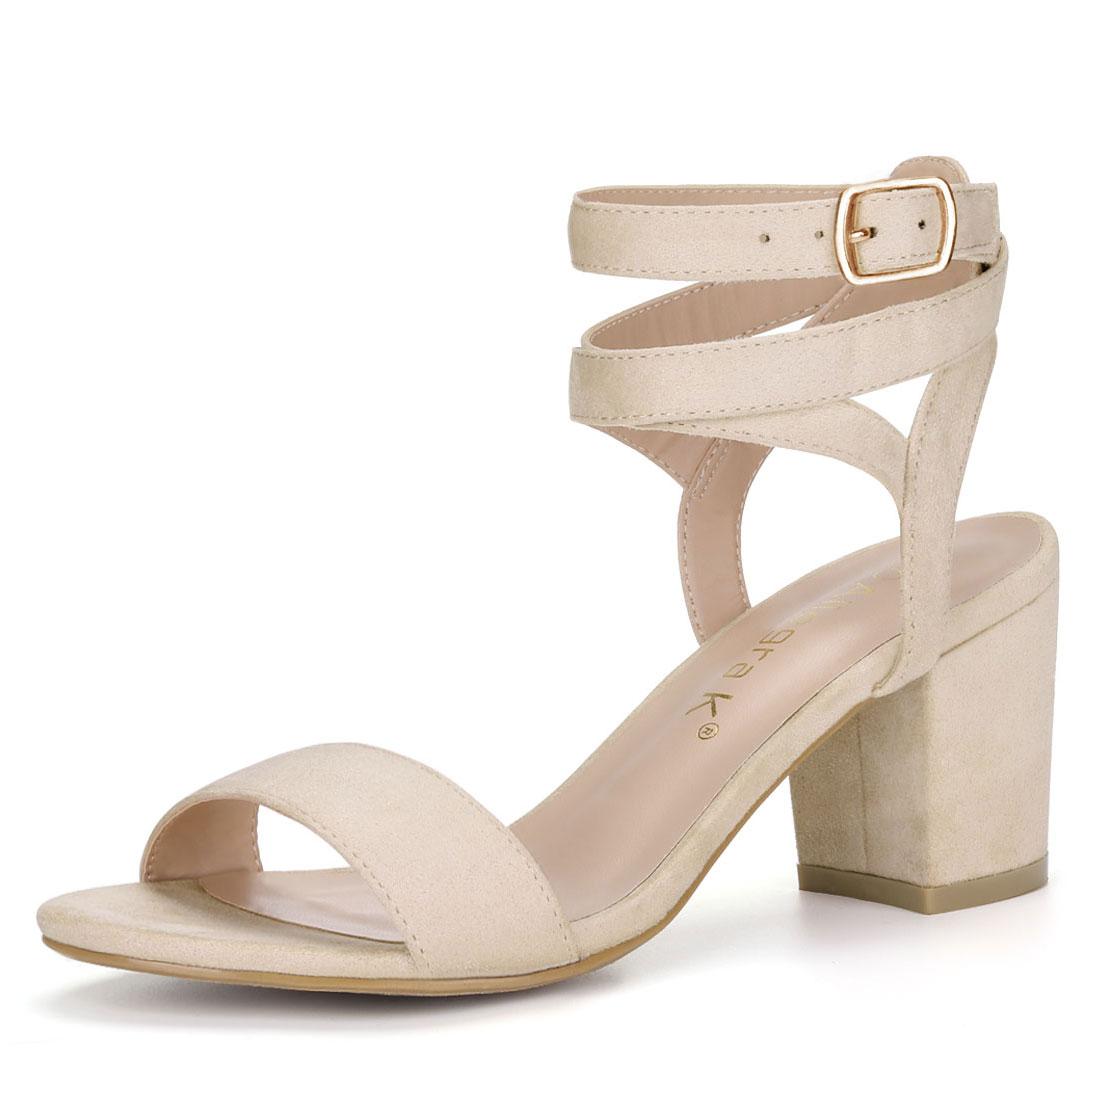 Allegra K Women's Block Heels Double Ankle Straps Sandals BeigeUS 5